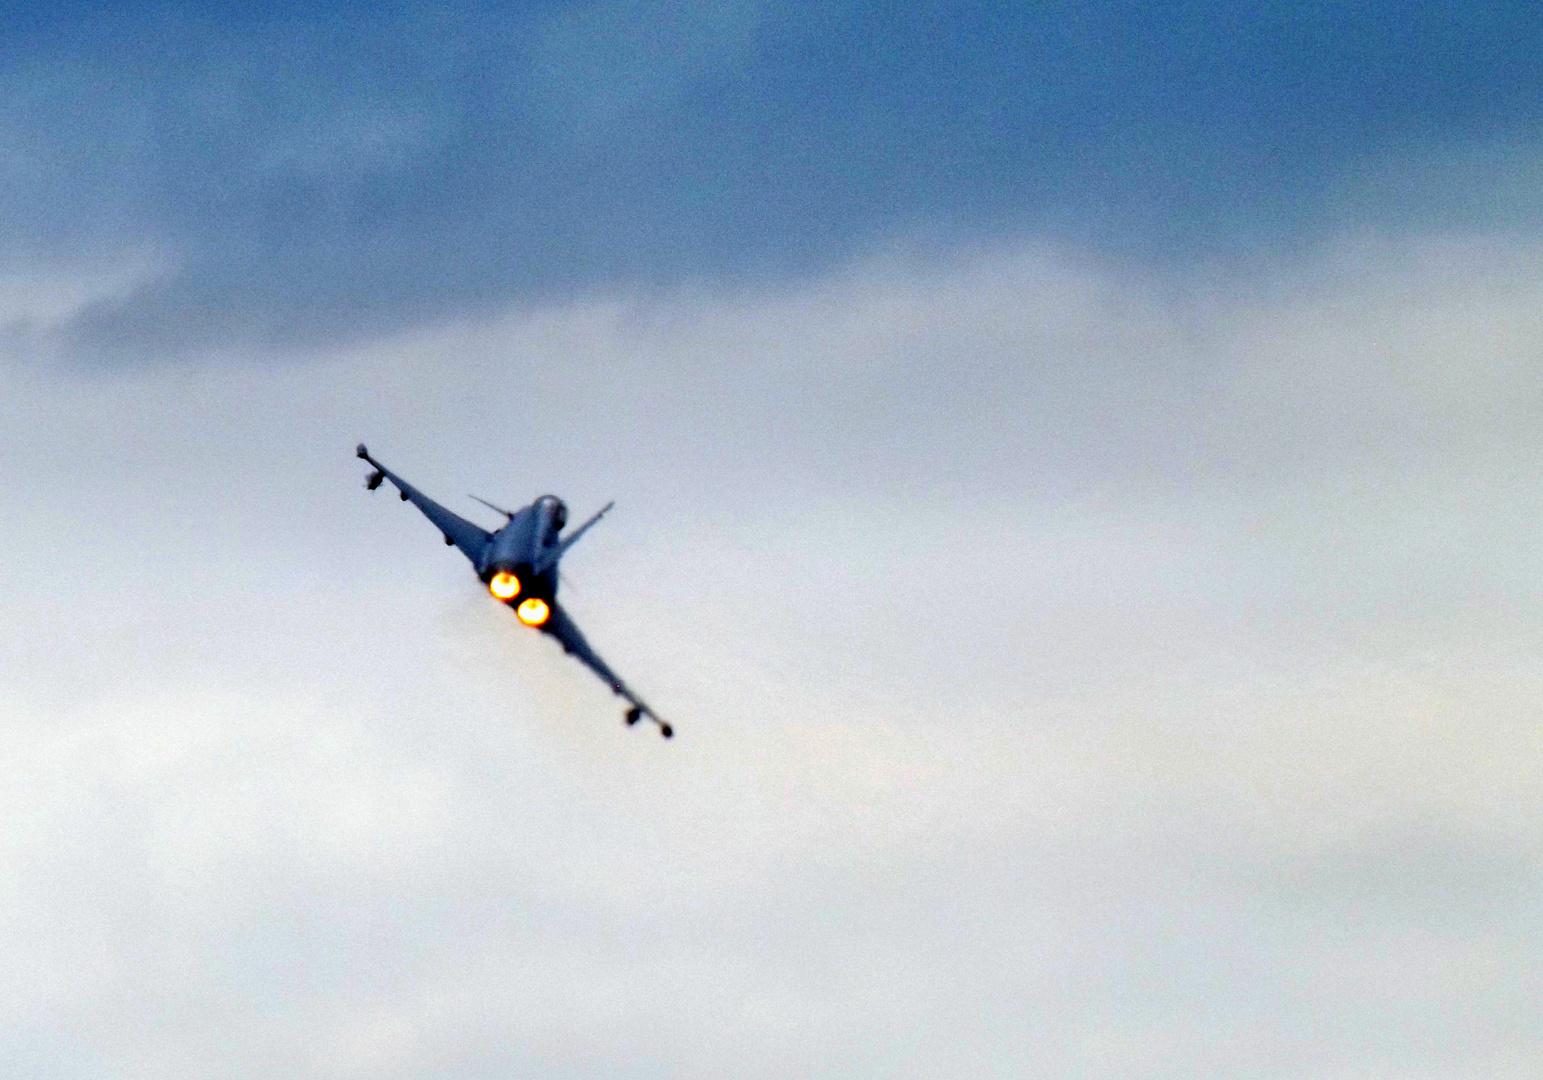 Airpower13